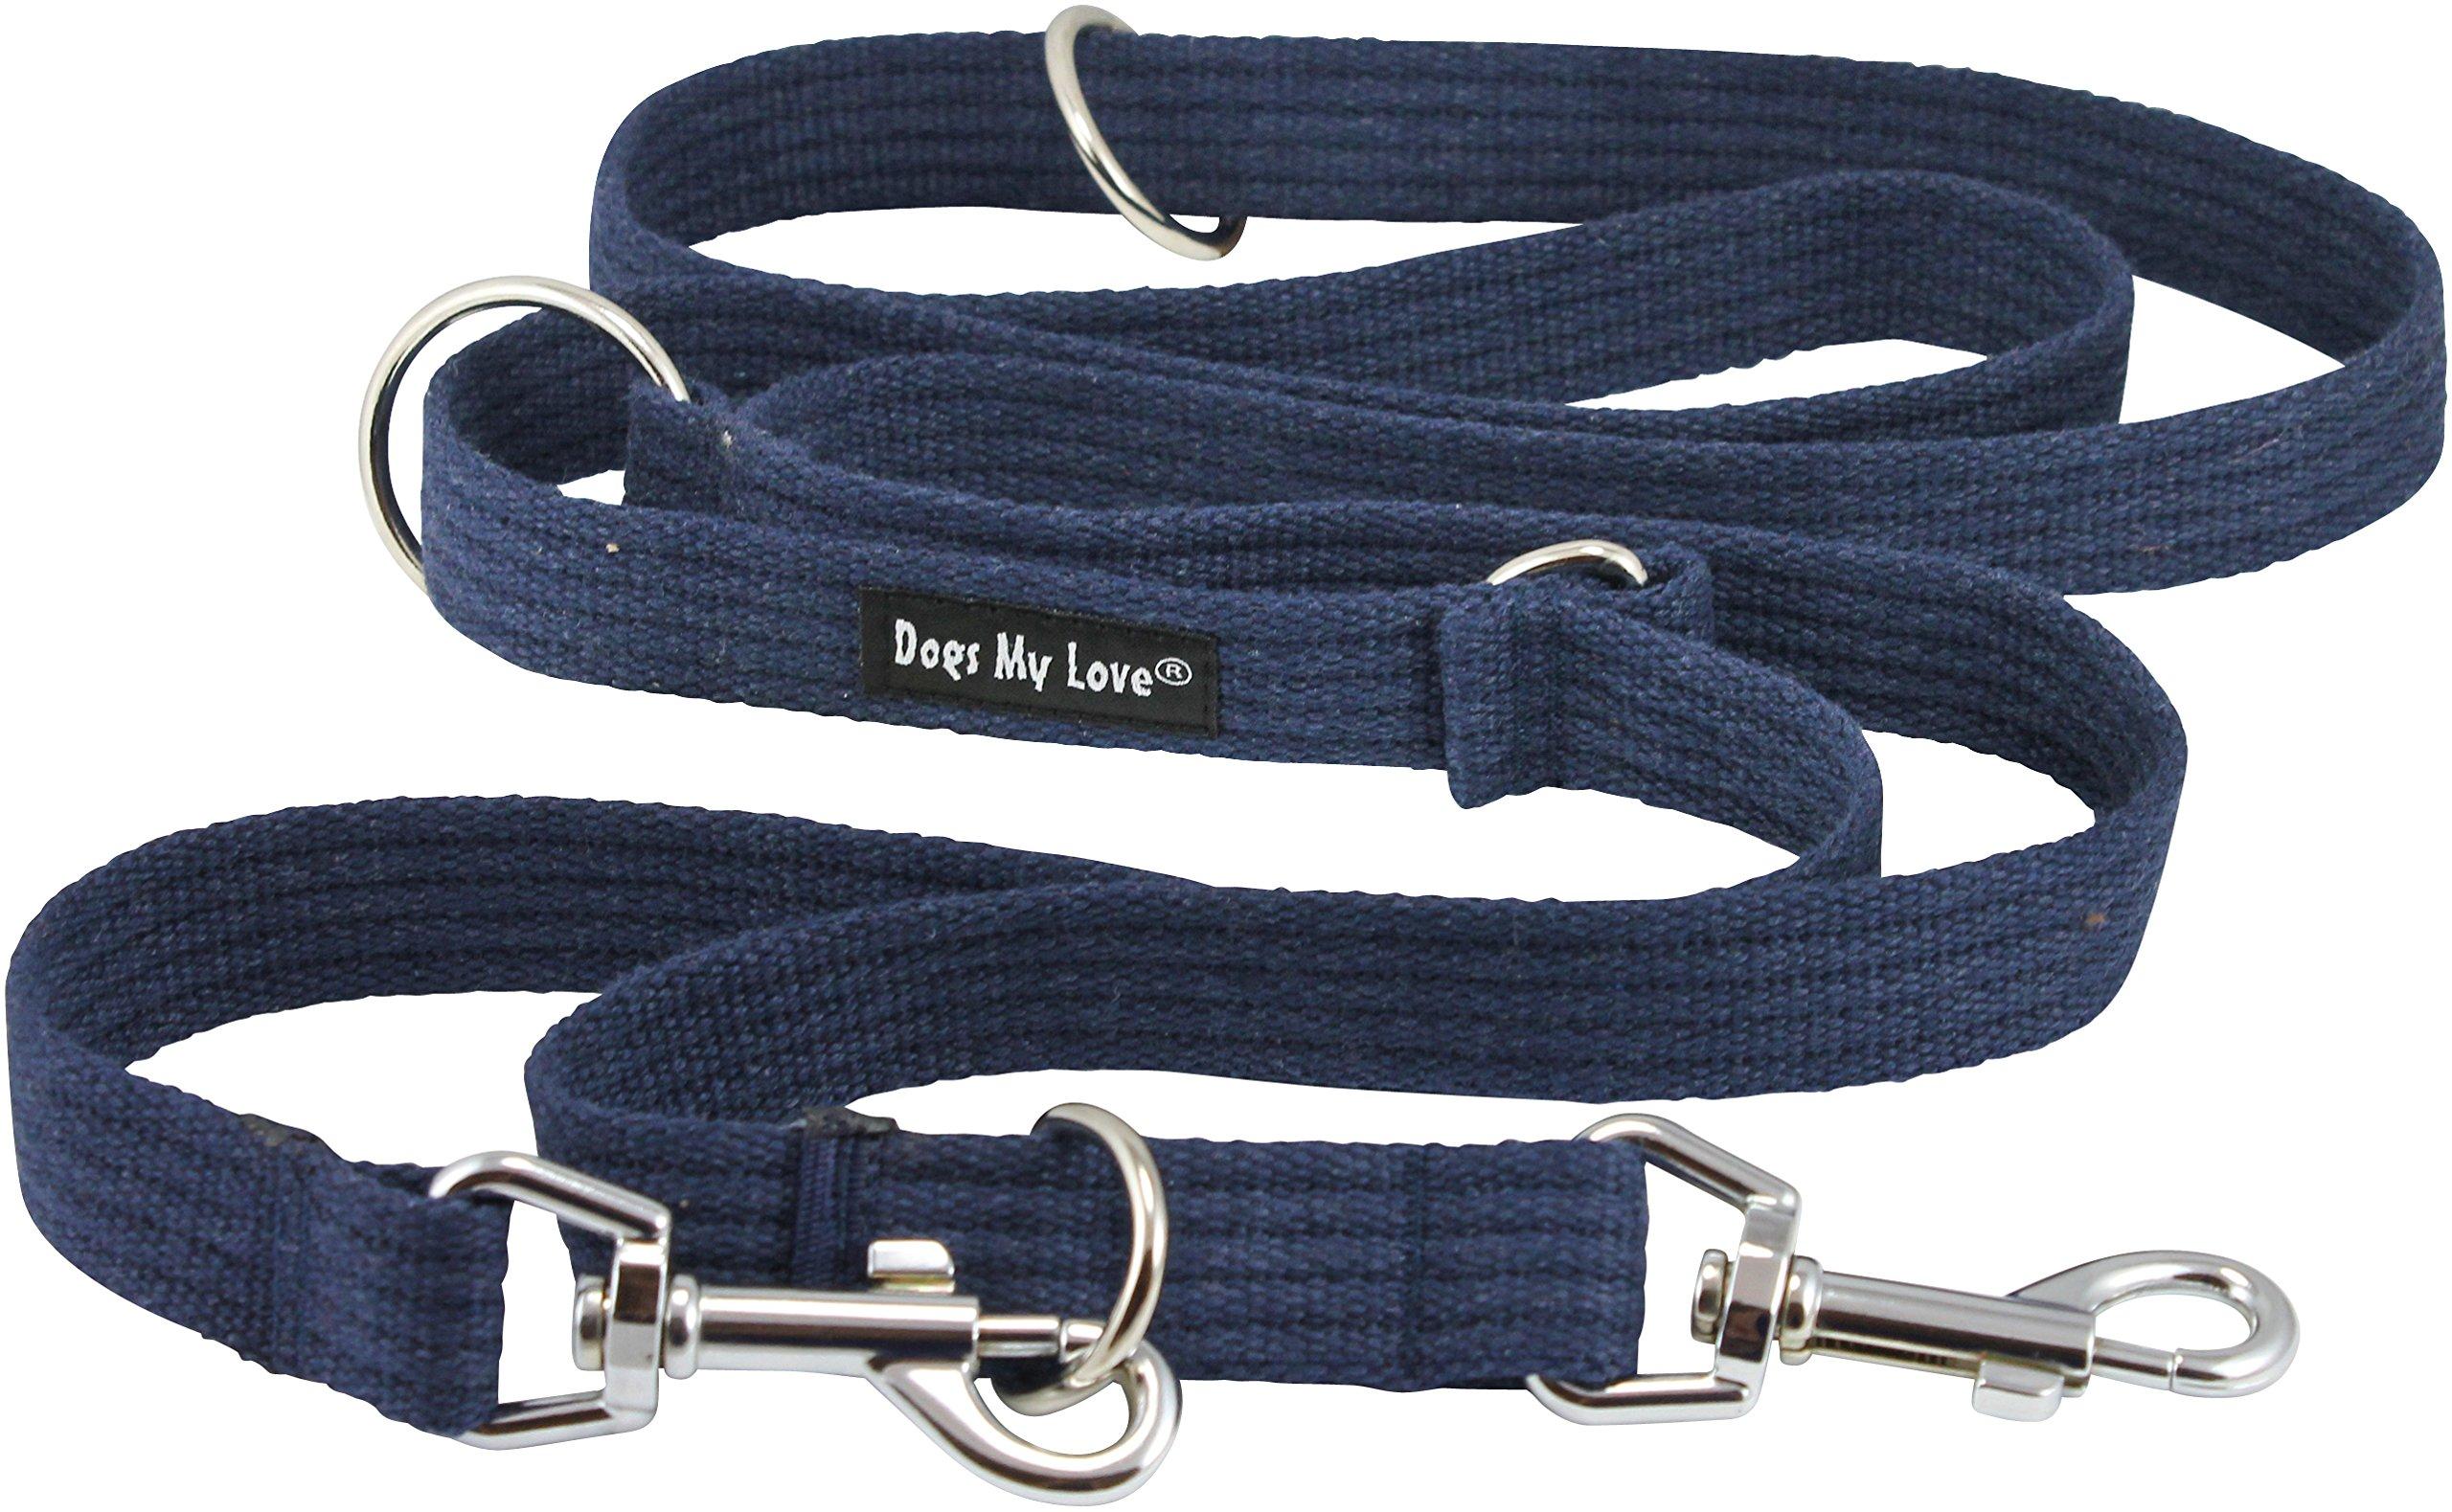 Dogs My Love 1'' Wide Cotton Web 6-Way European Multi-Functional Dog Leash, Adjustable Lead 45''-78'' Long, Large (Blue)